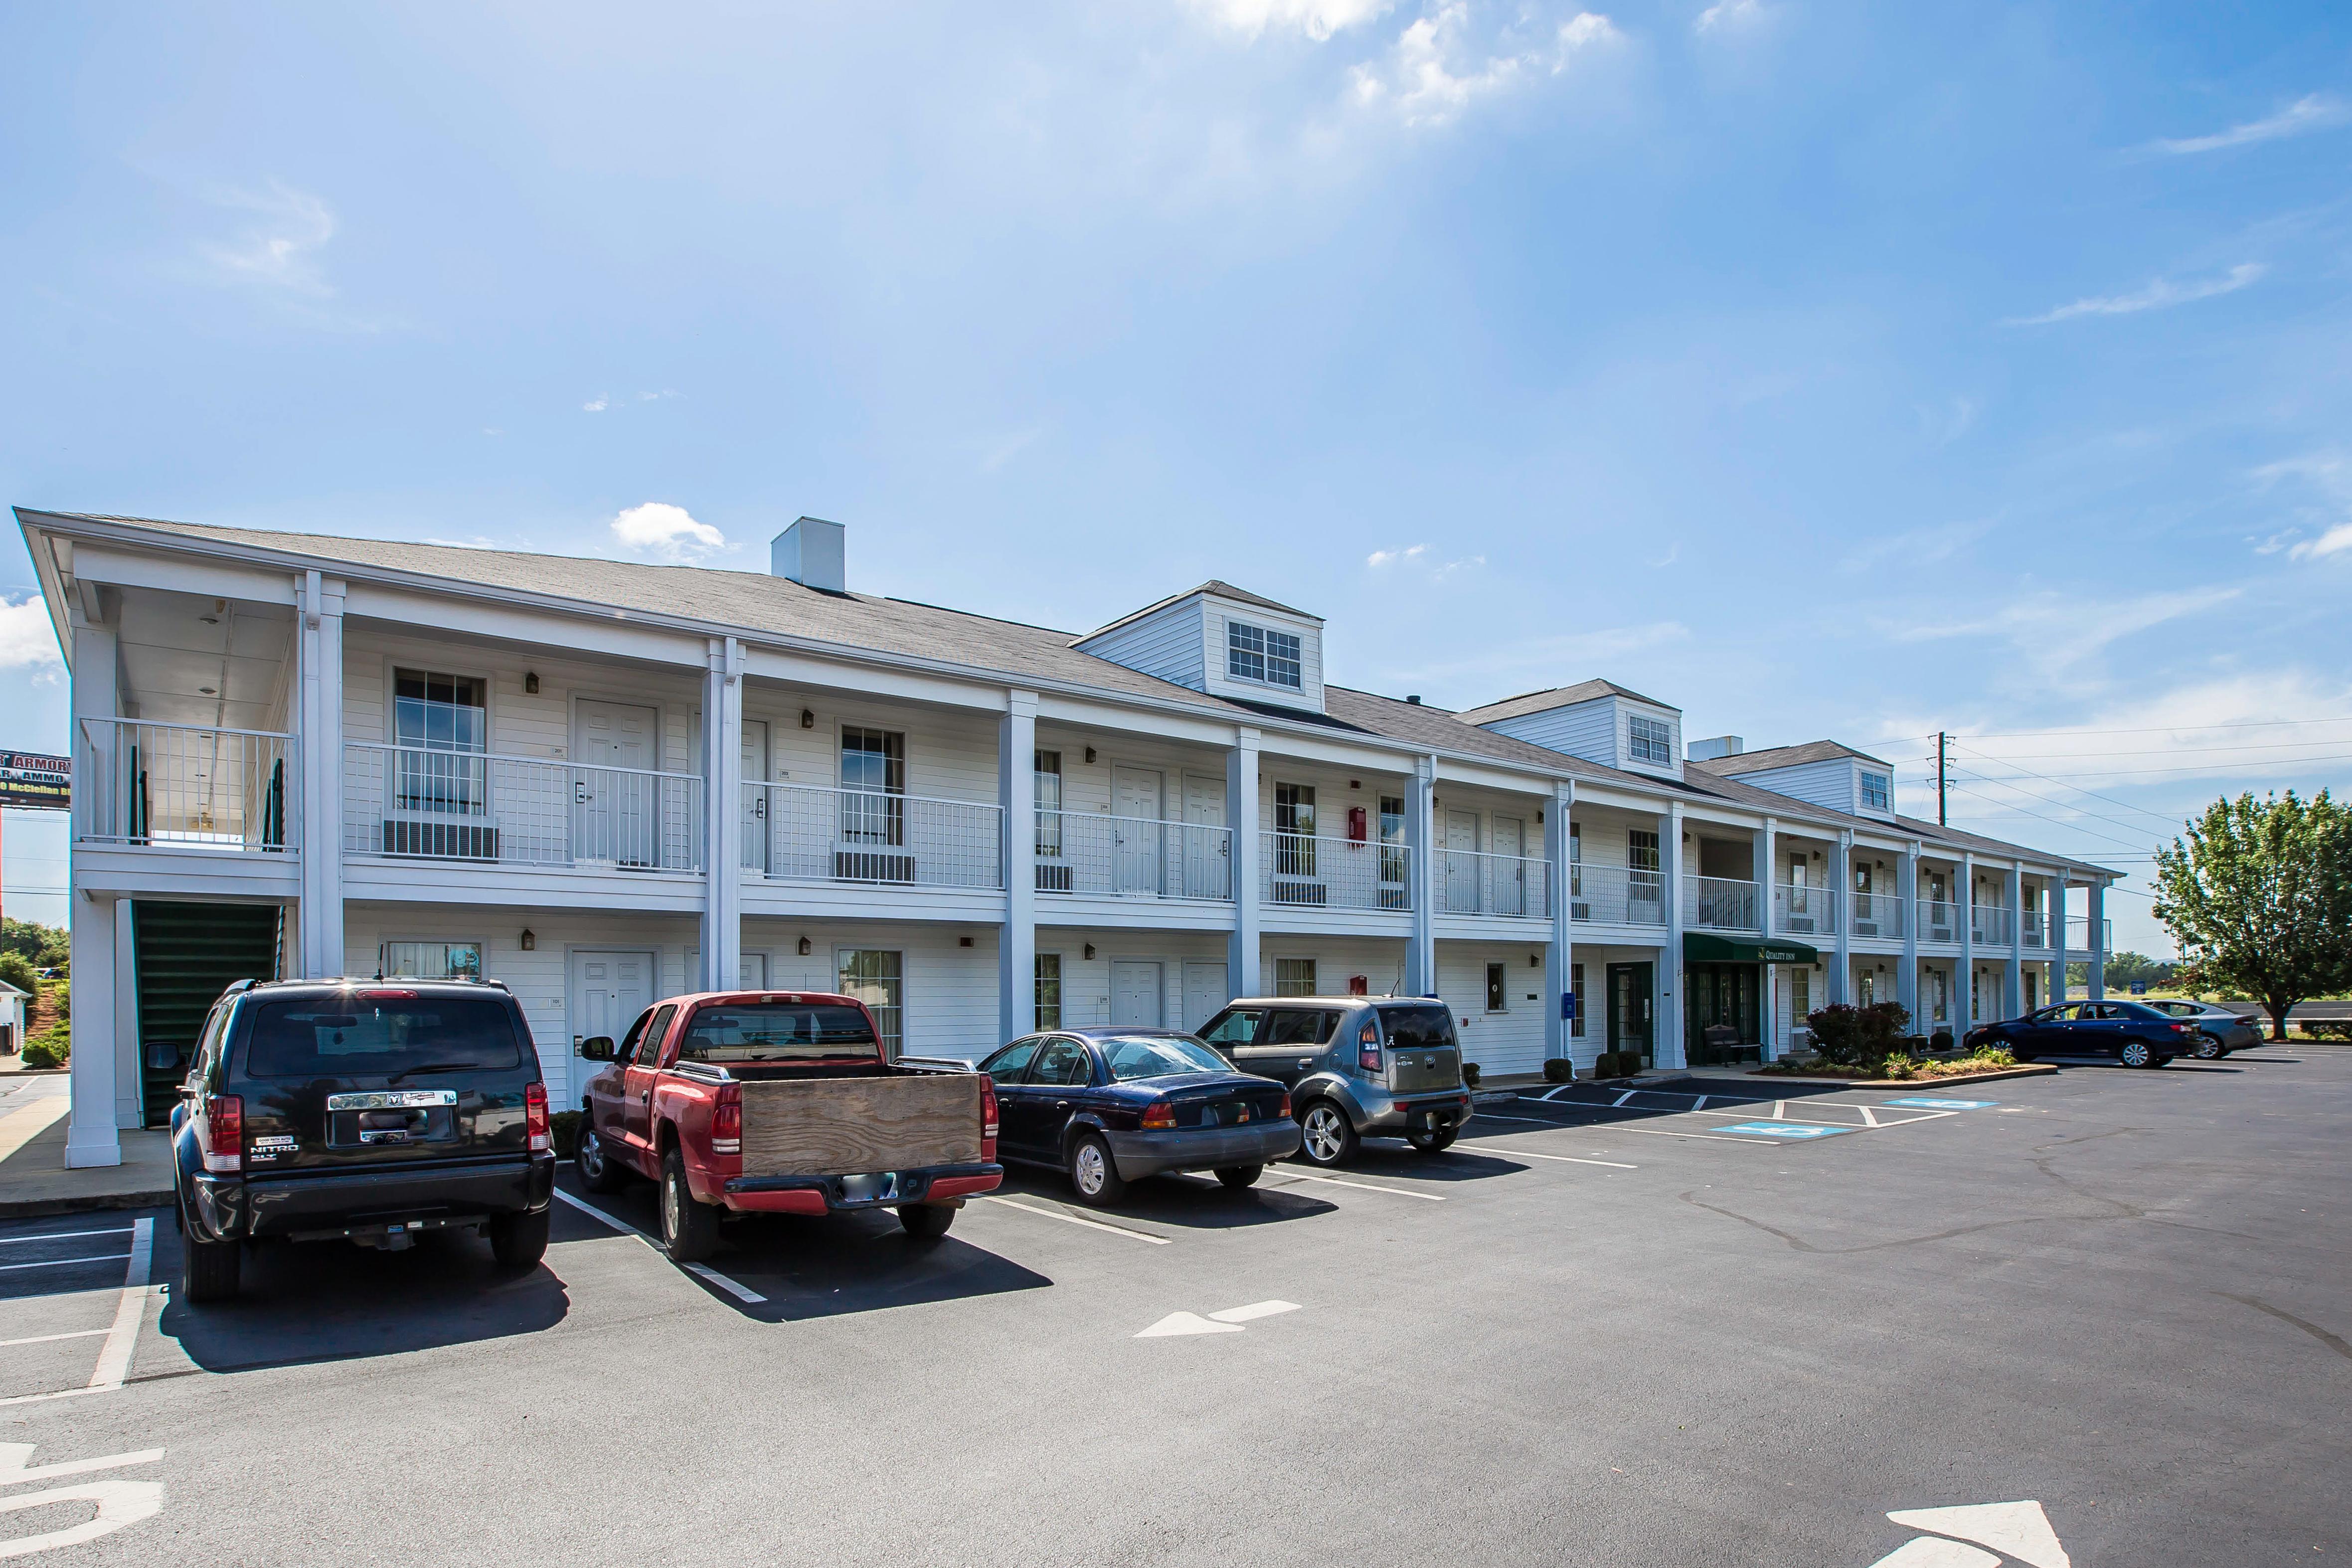 Red Roof Inn Amp Suites Oxford Al Oxford Alabama Travel